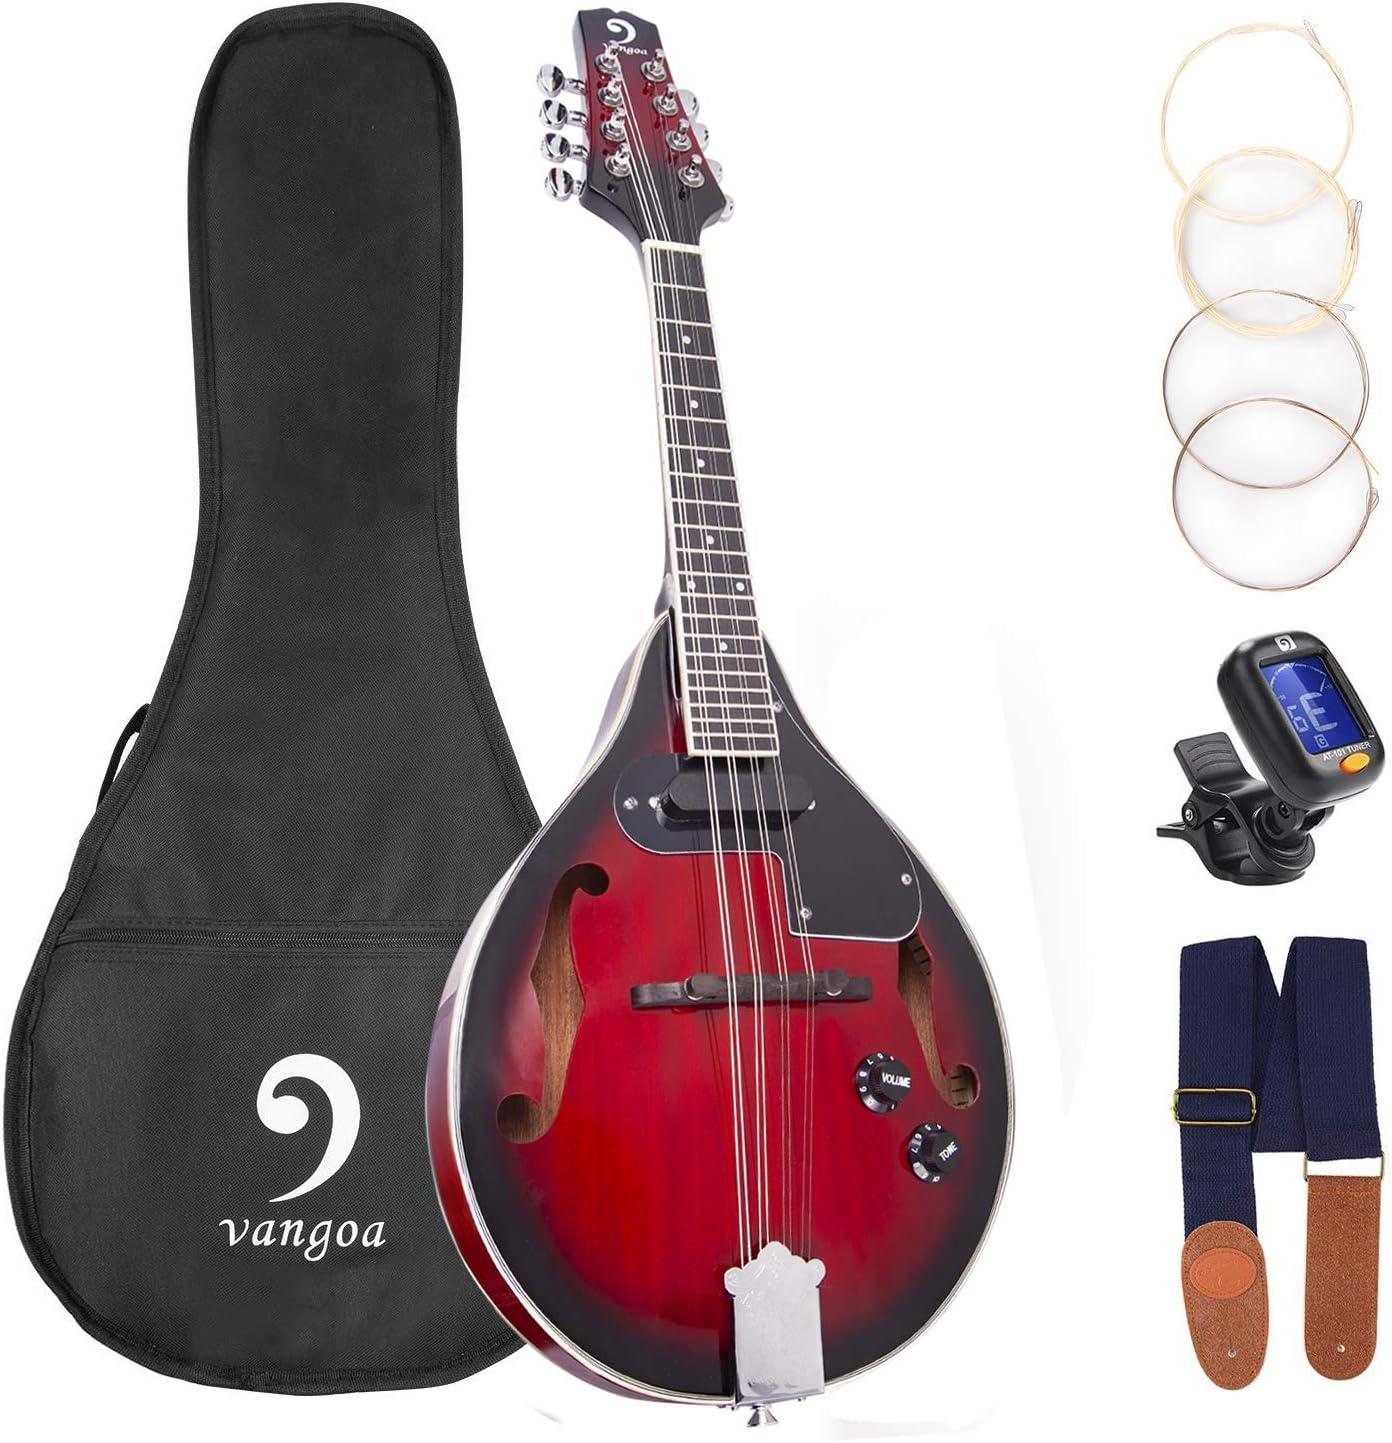 Mandolin A Style Acoustic Electric Mandolins Instrument Vintage Red Sunburst Mahogany Wood for Beginner Adults